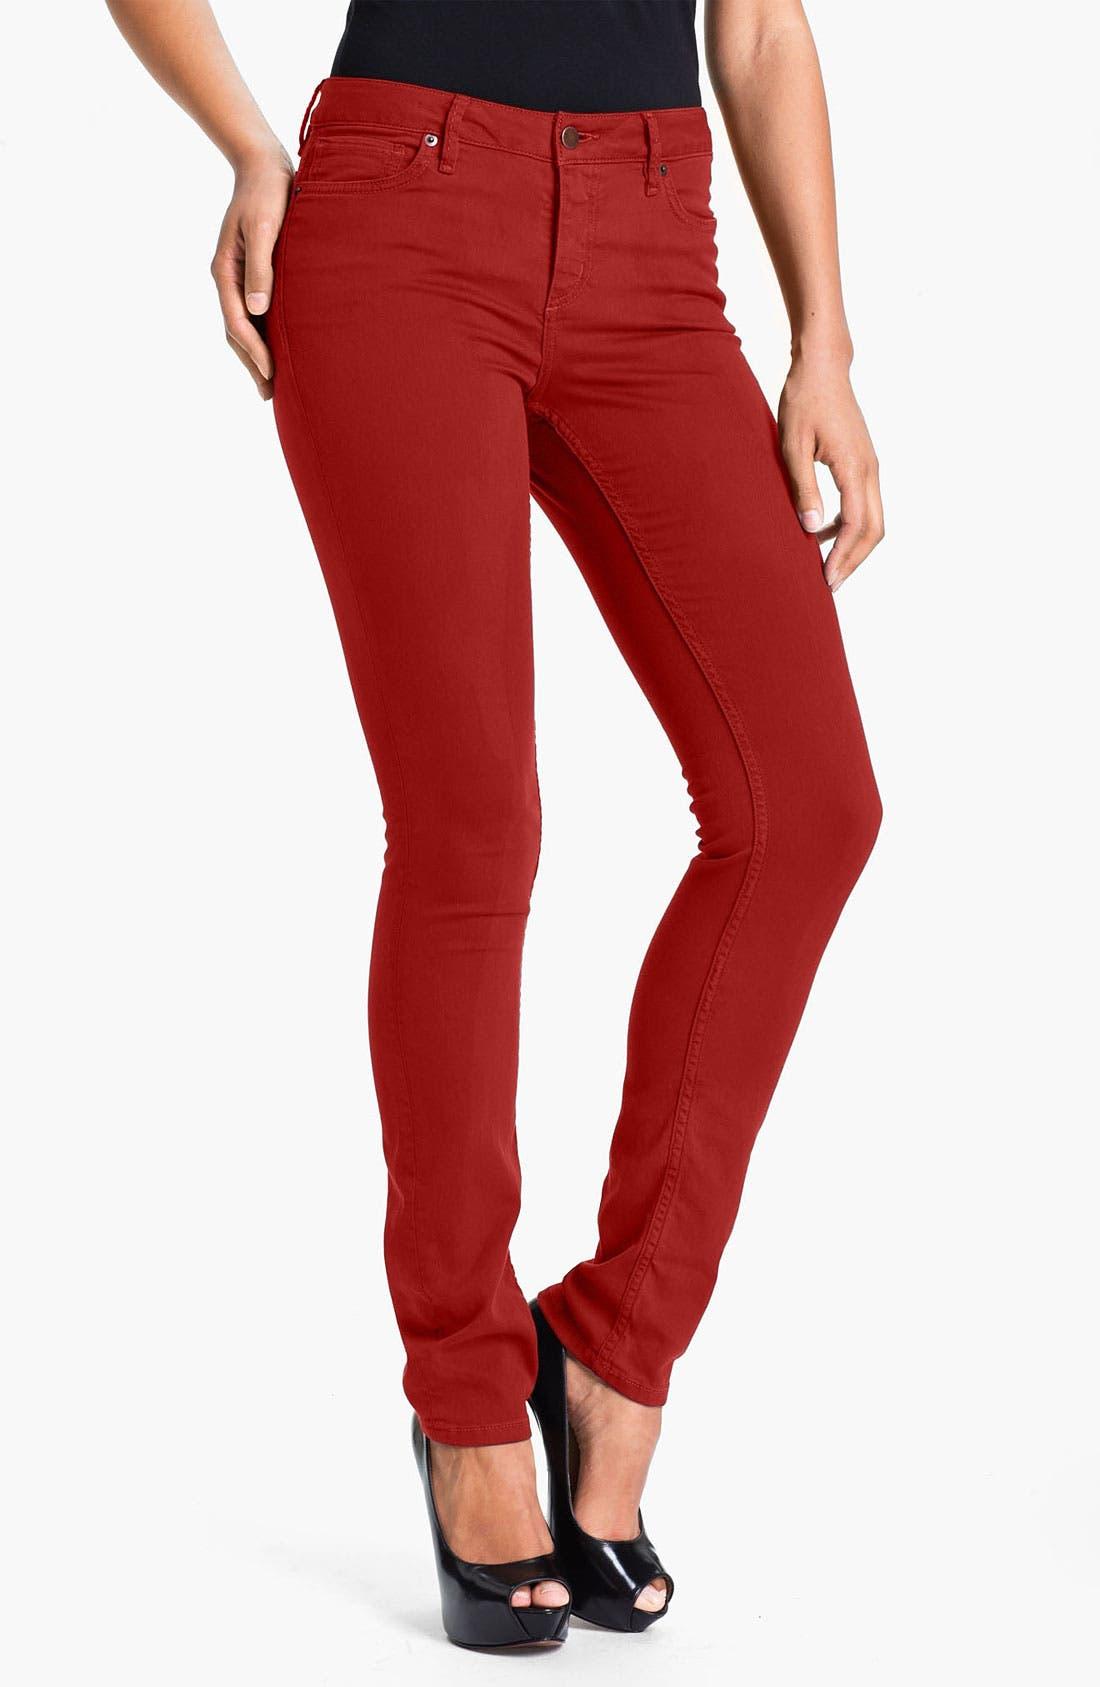 Alternate Image 1 Selected - Christopher Blue 'Sophia' Twill Skinny Jeans